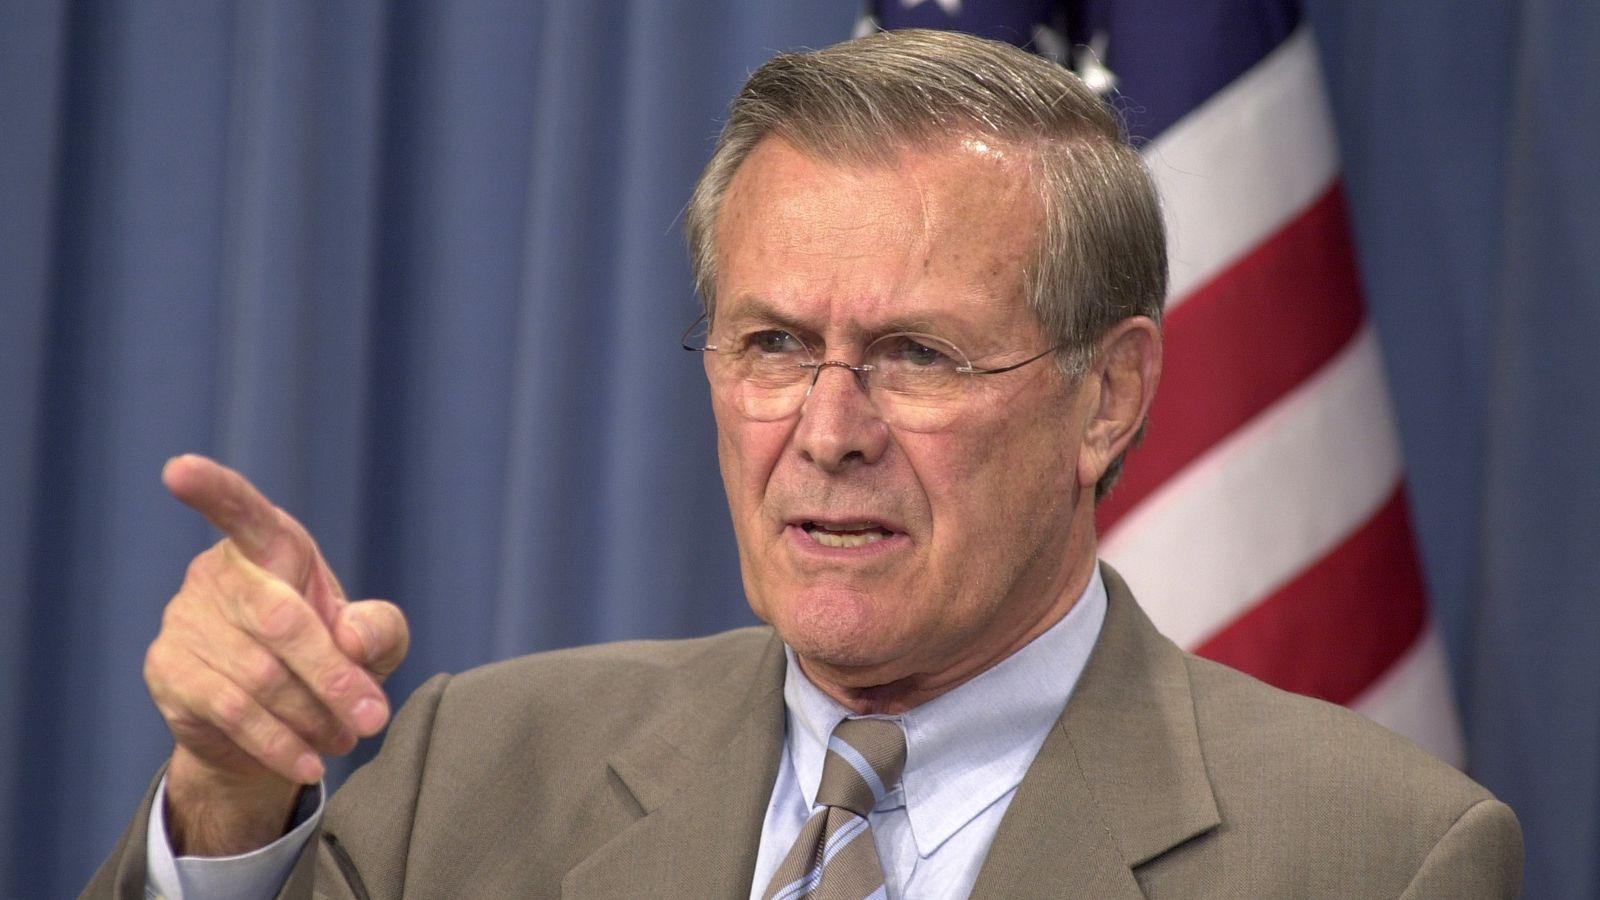 Dick cheney rumsfeld, smoking fucking in latex prono